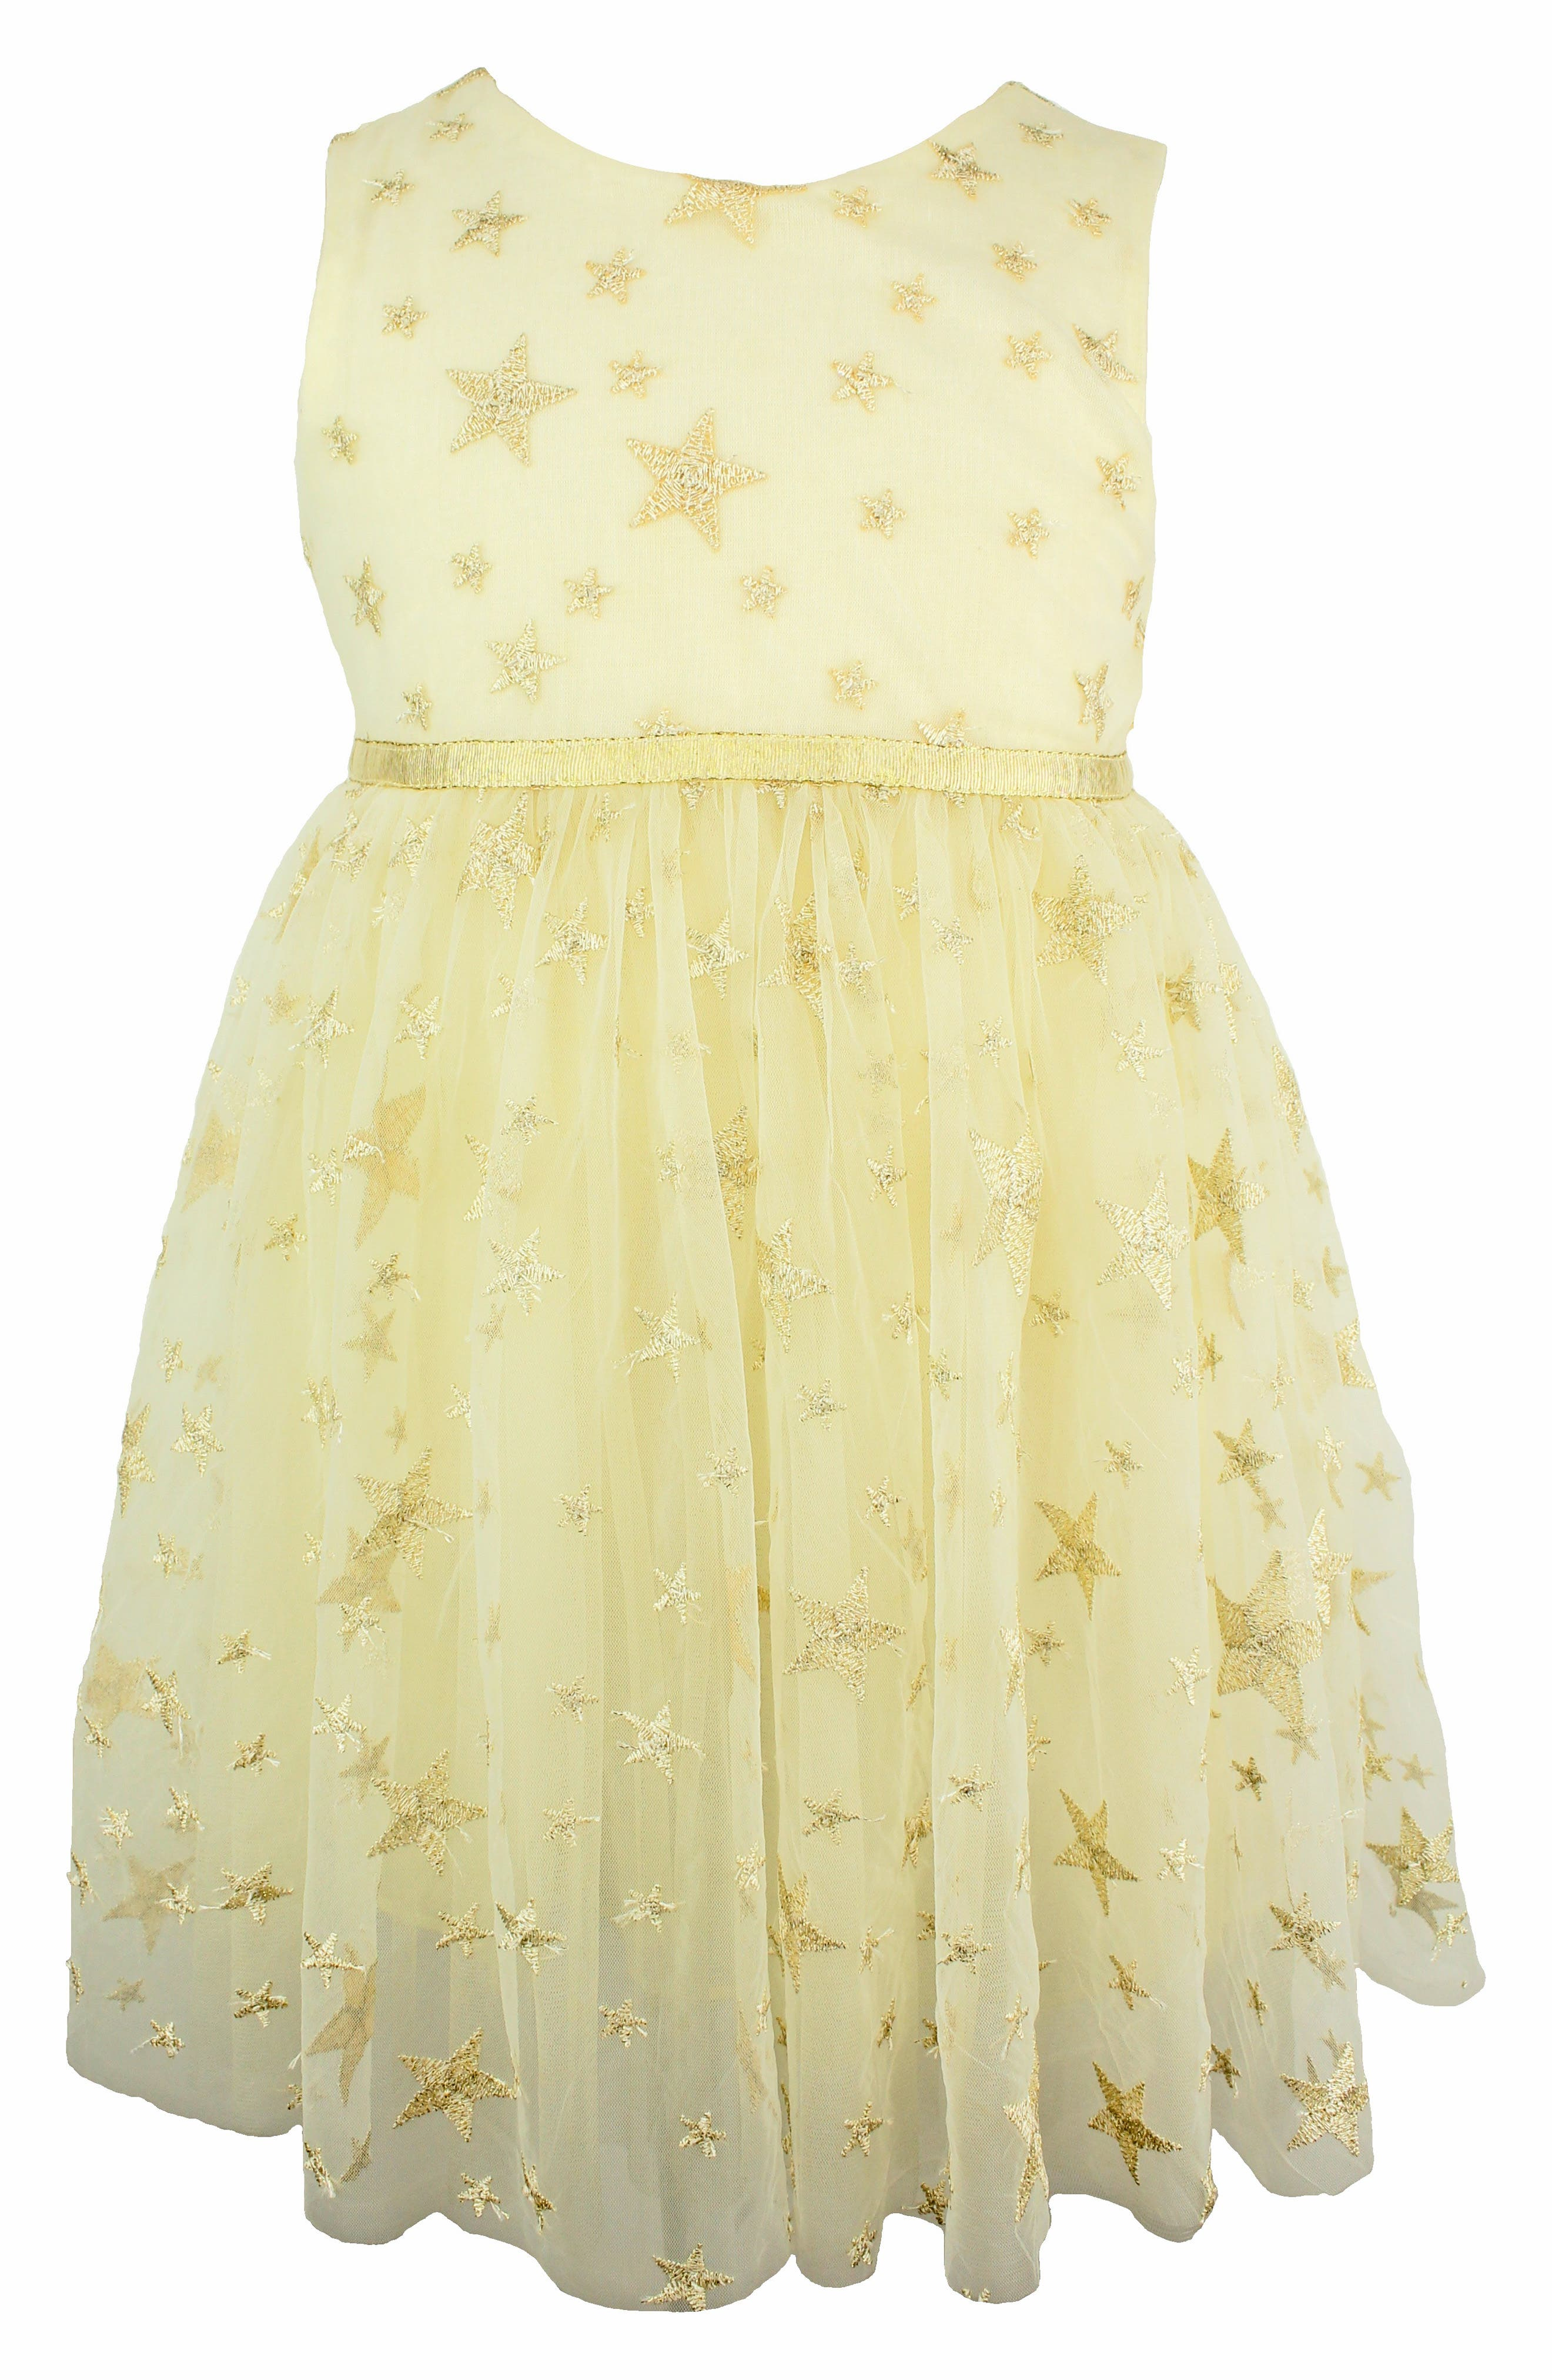 POPATU, Embroidered Star Dress, Main thumbnail 1, color, CREAM